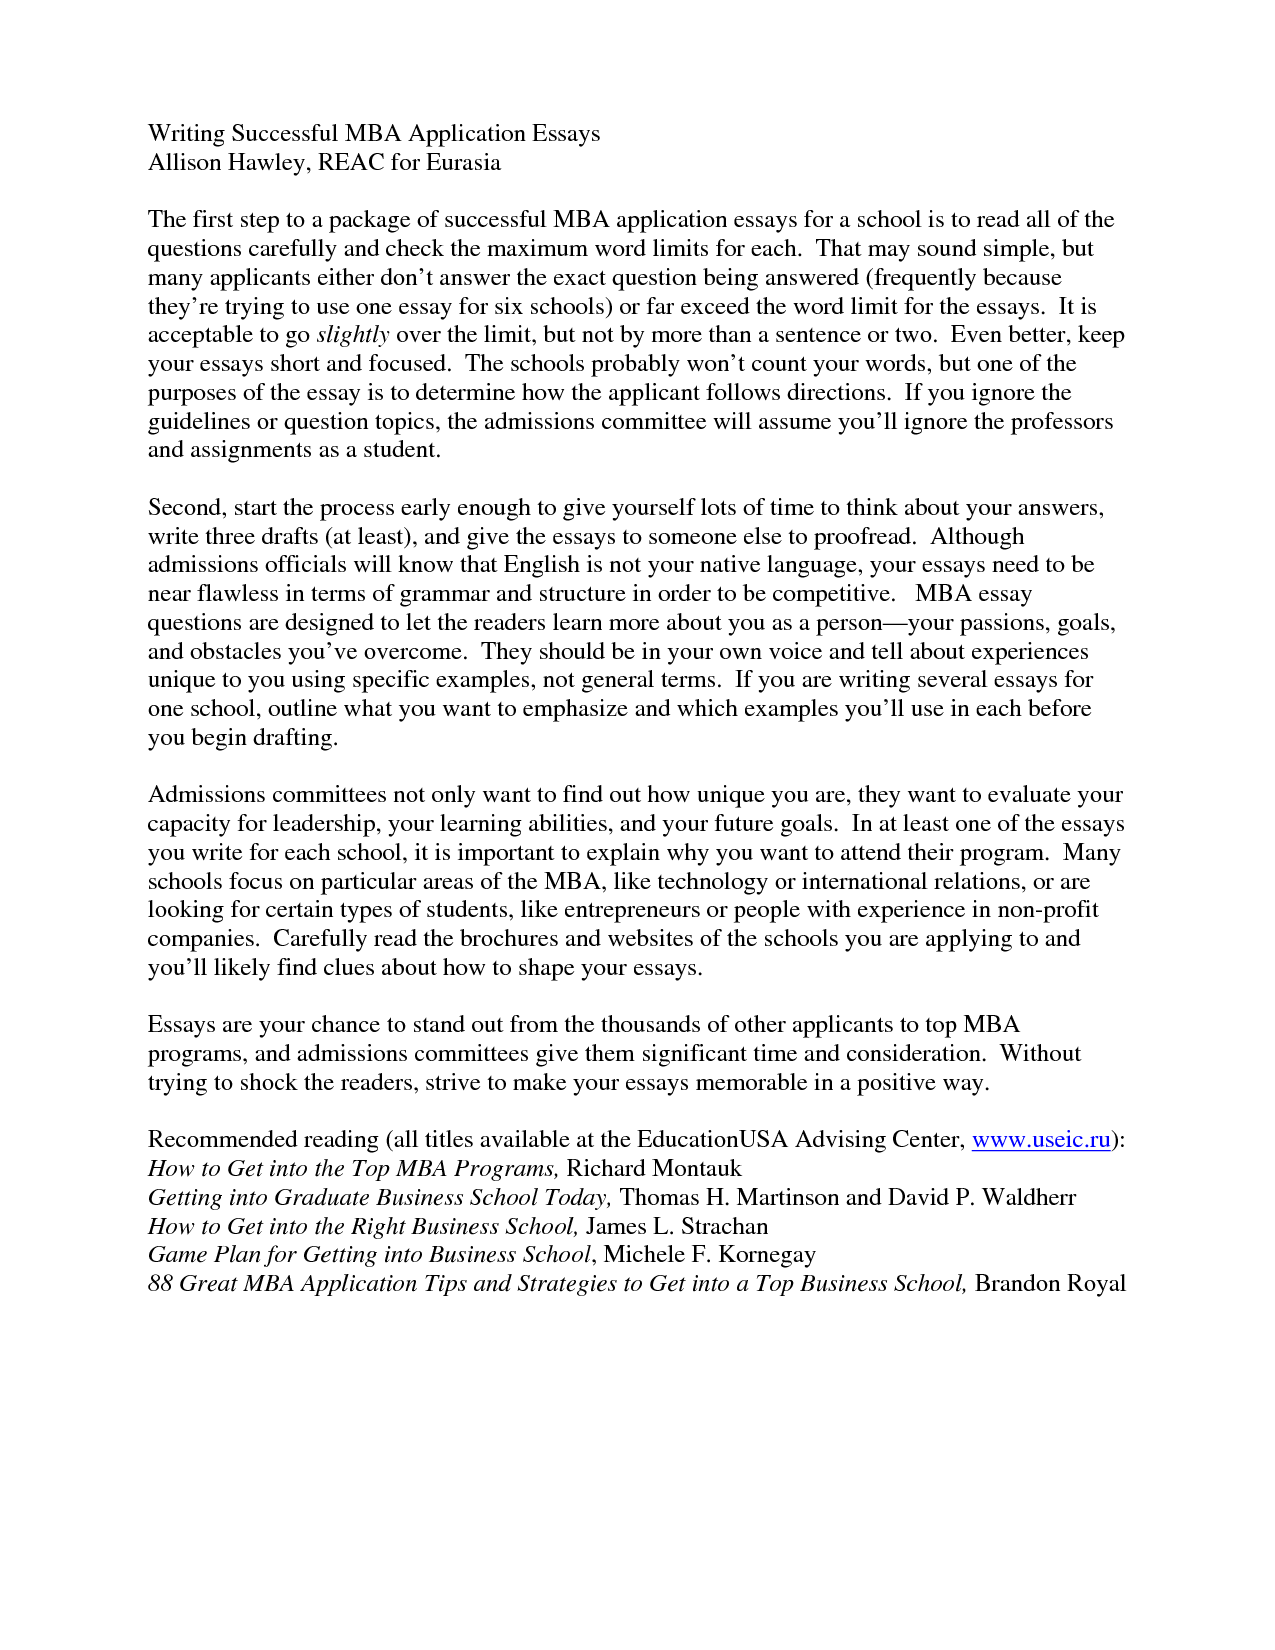 Mba admission essay buy executive